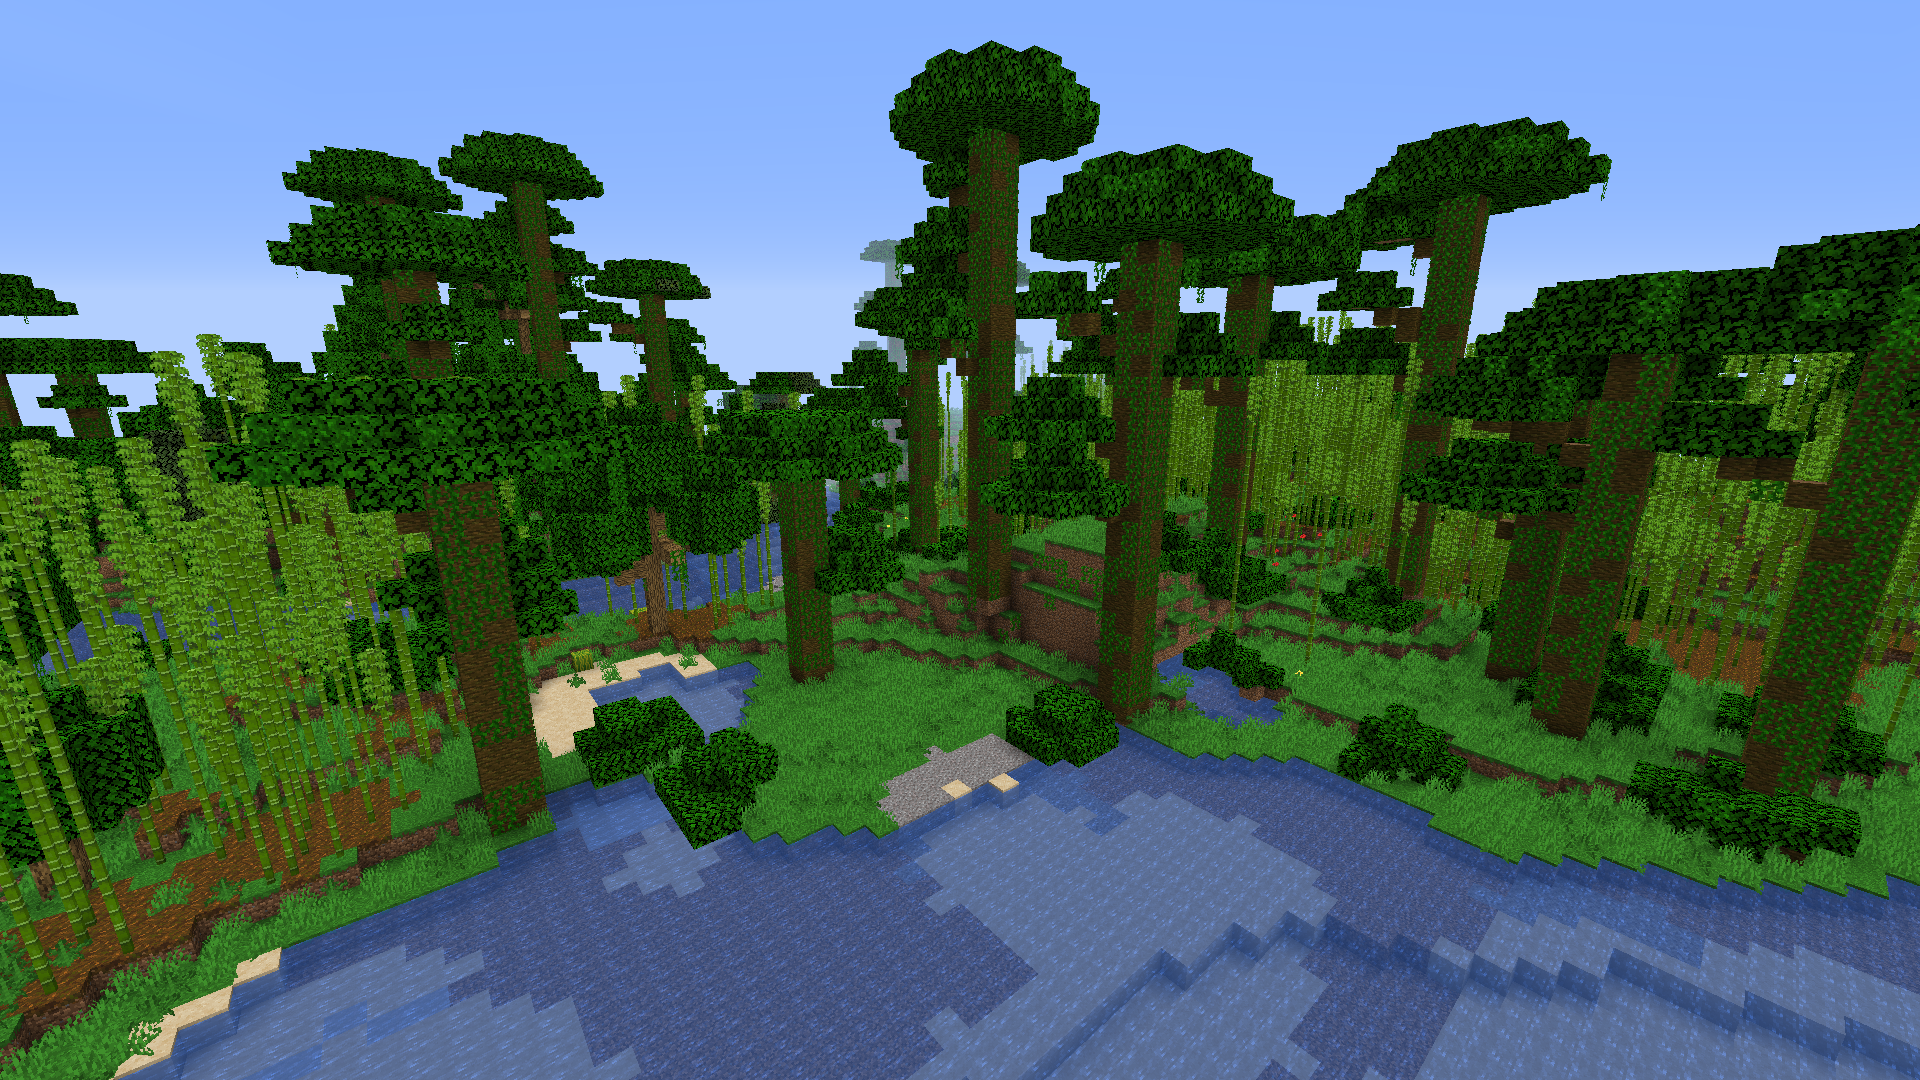 Bamboo Jungle Minecraft Biomes Wiki Fandom Powered By Wikia